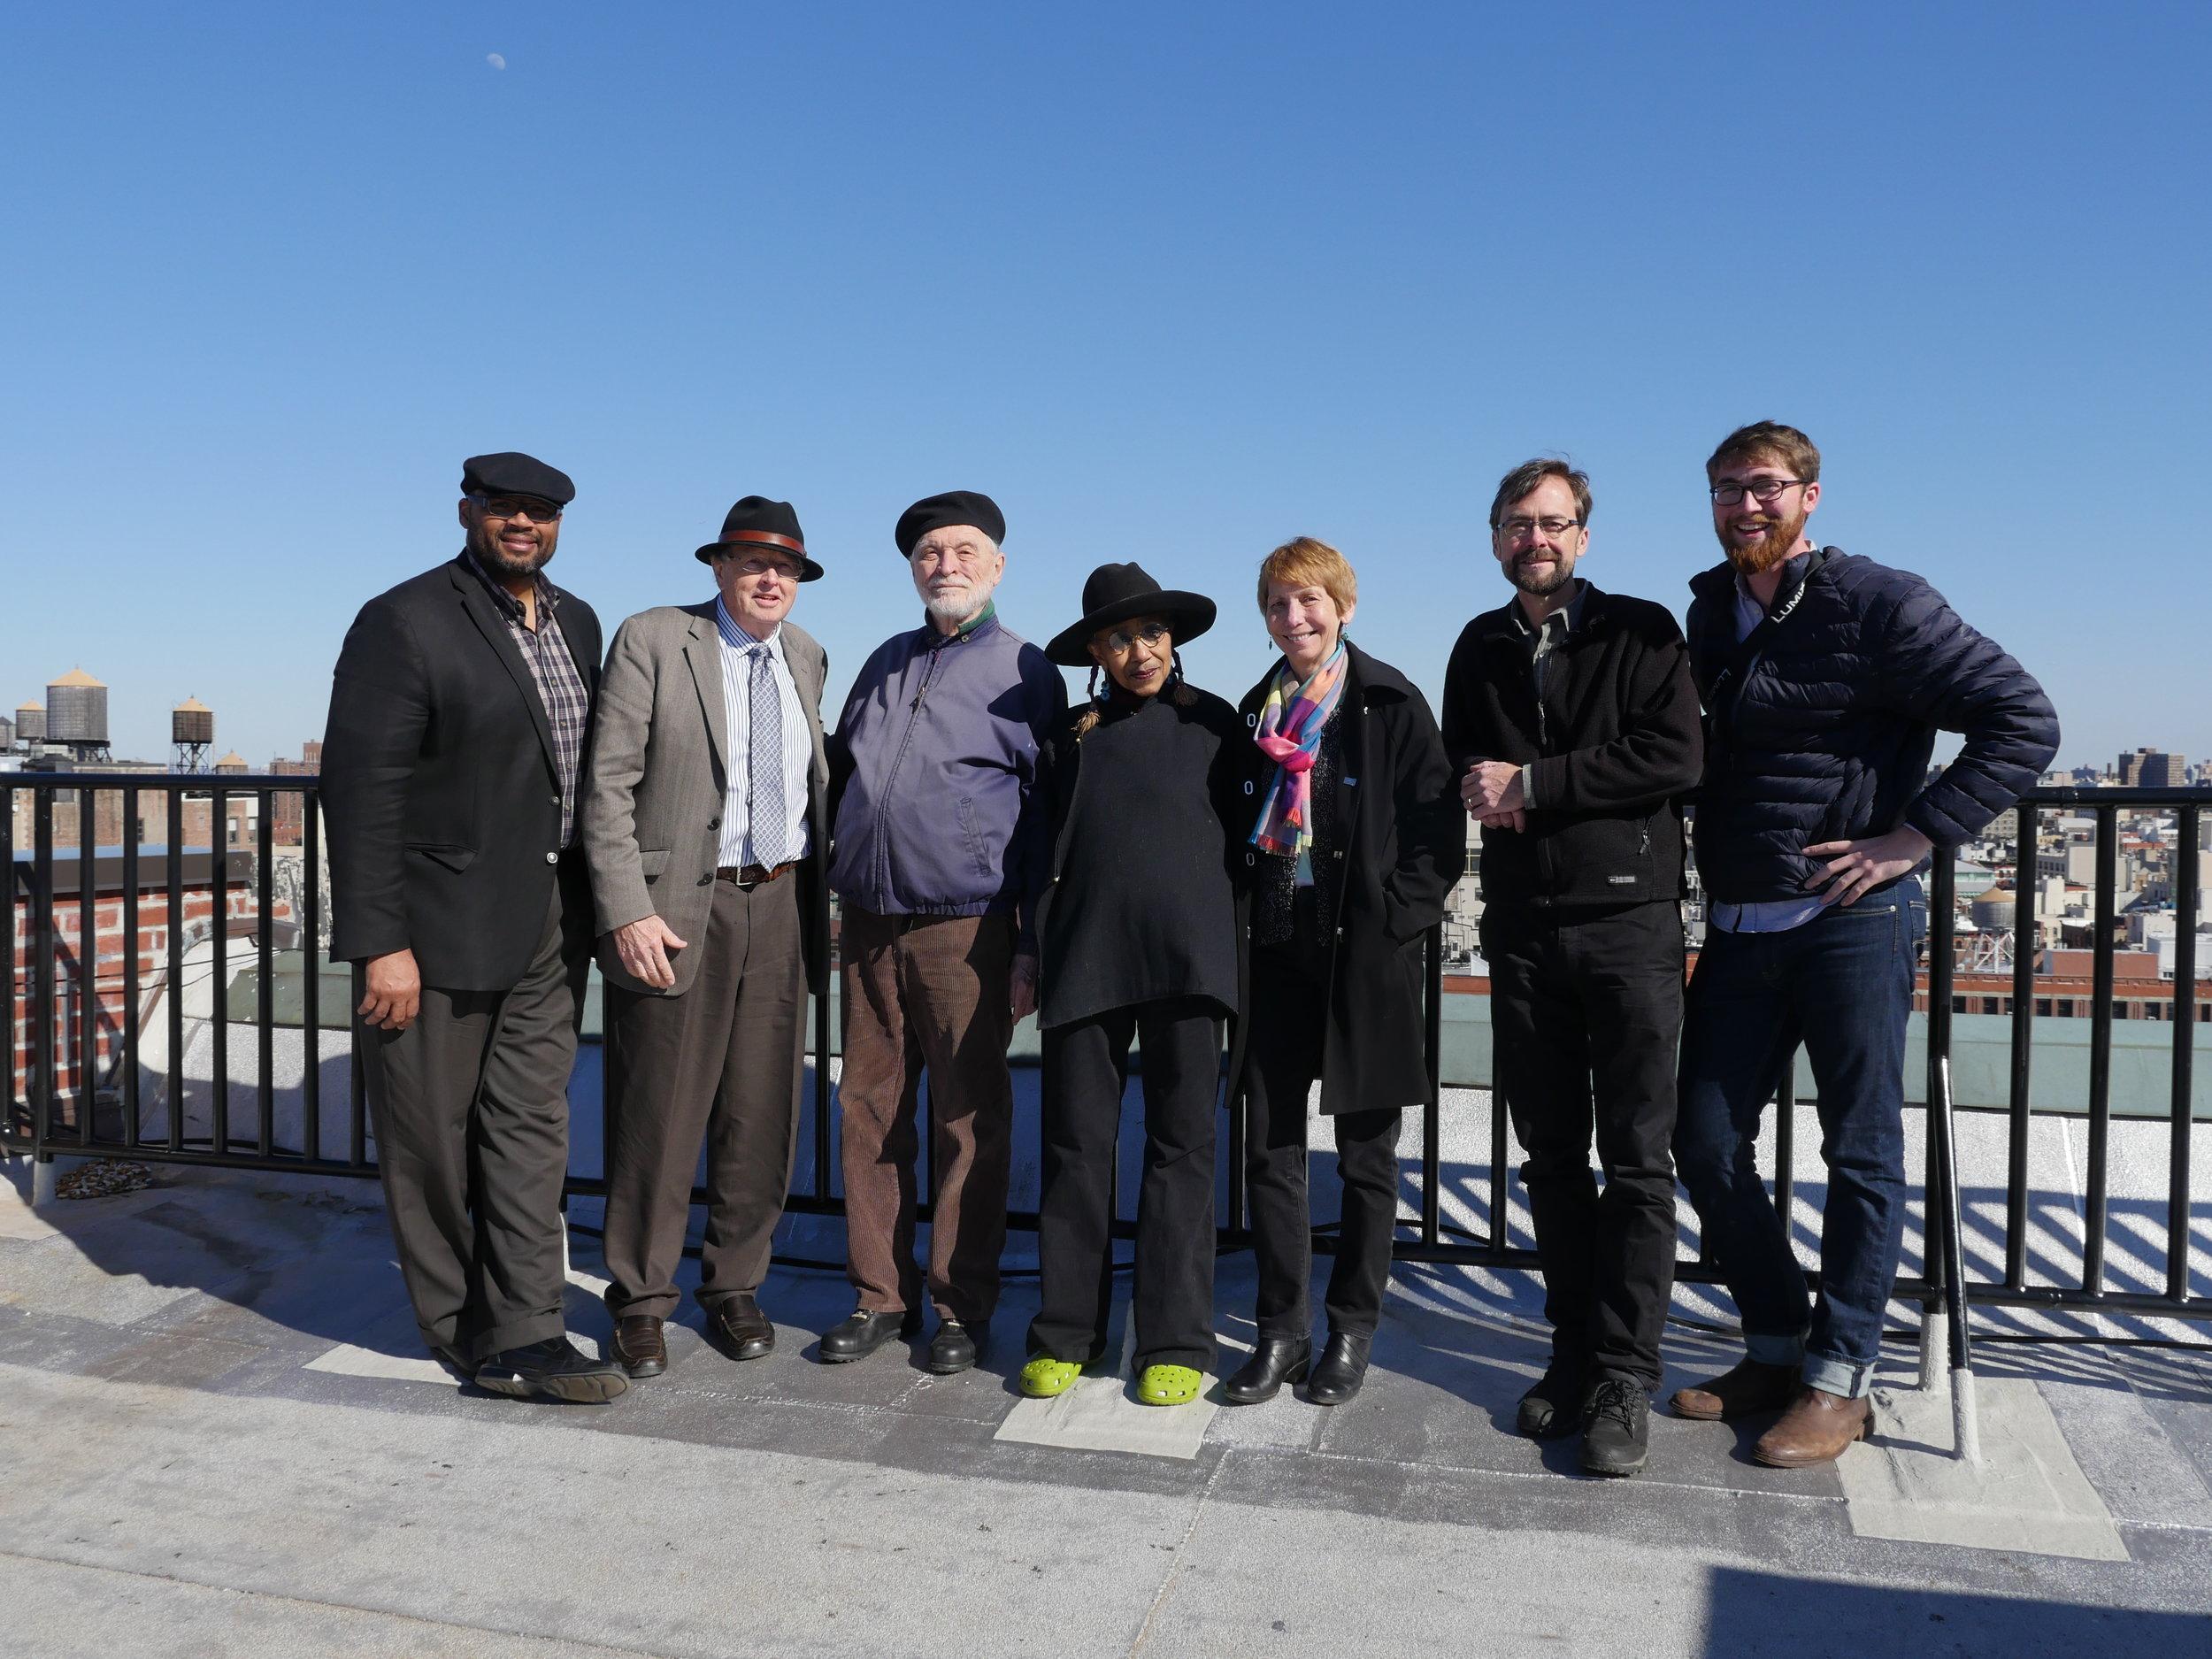 (from left) Pellom McDaniels, Randall Burkett, James Hatch, Camille Billops, Rosemary Magee, Hal Jacobs, Henry Jacobs